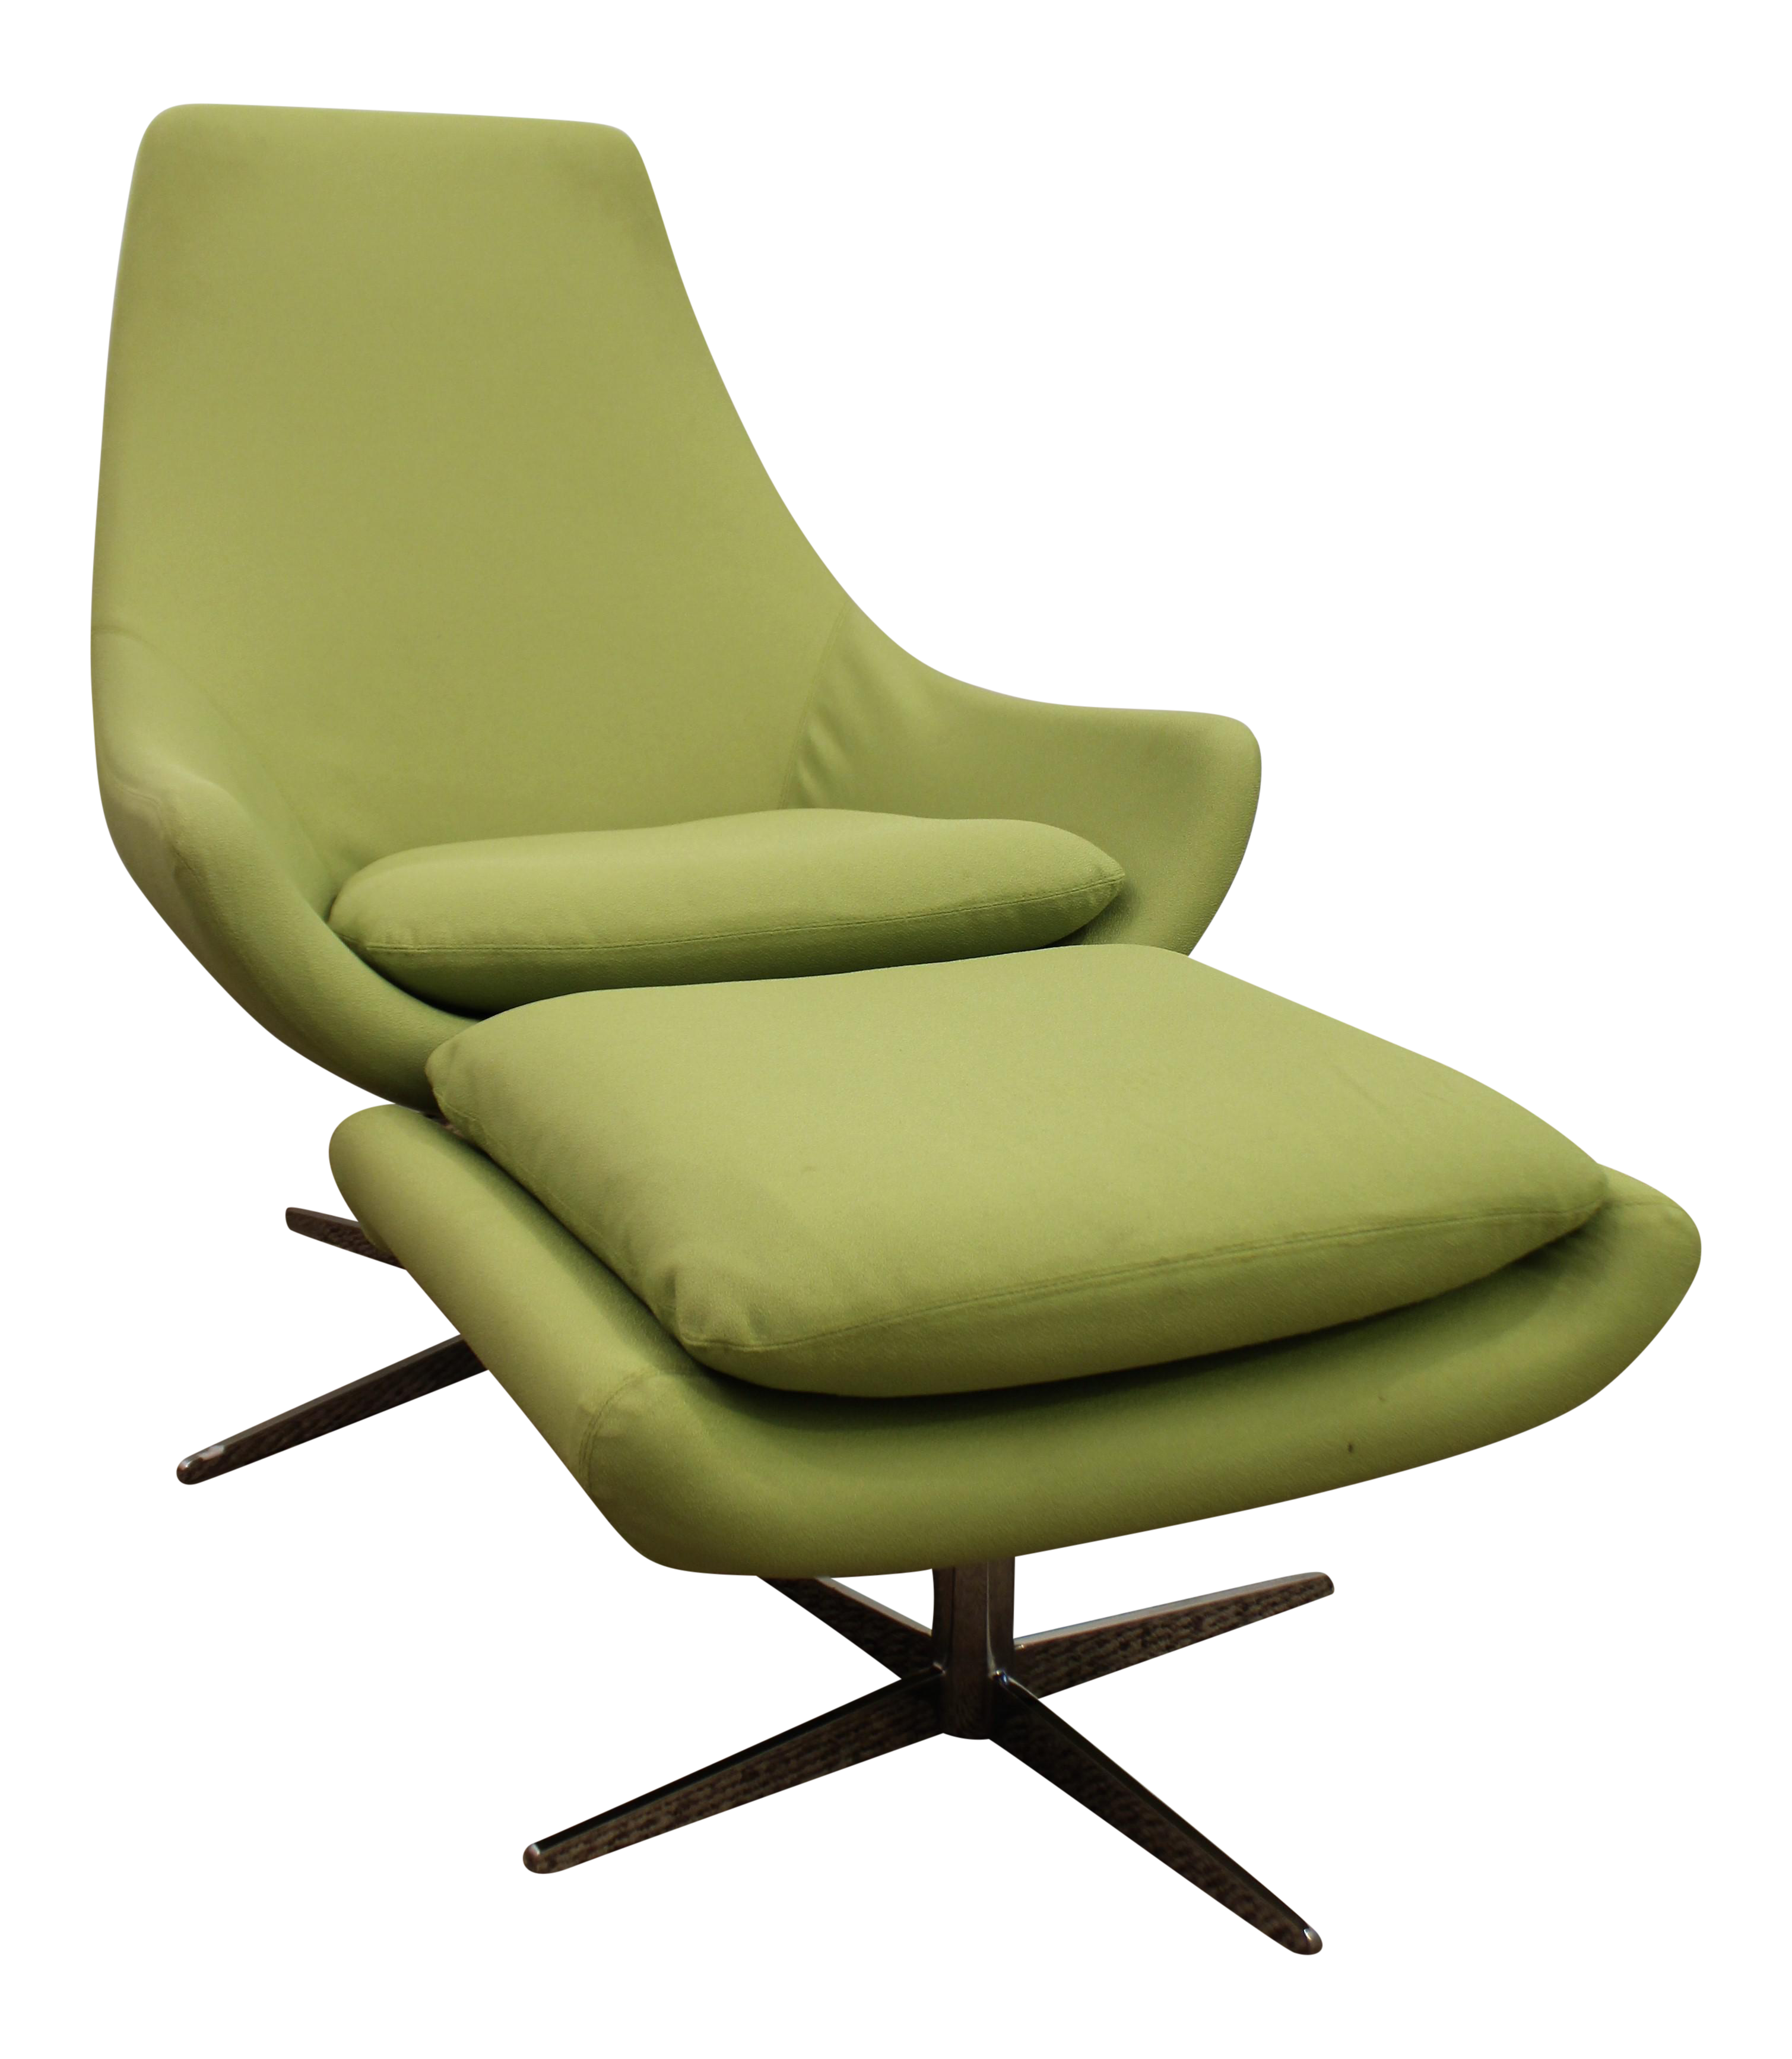 Mid Century Danish Modern Lime Green Swivel Lounge Chair & Ottoman